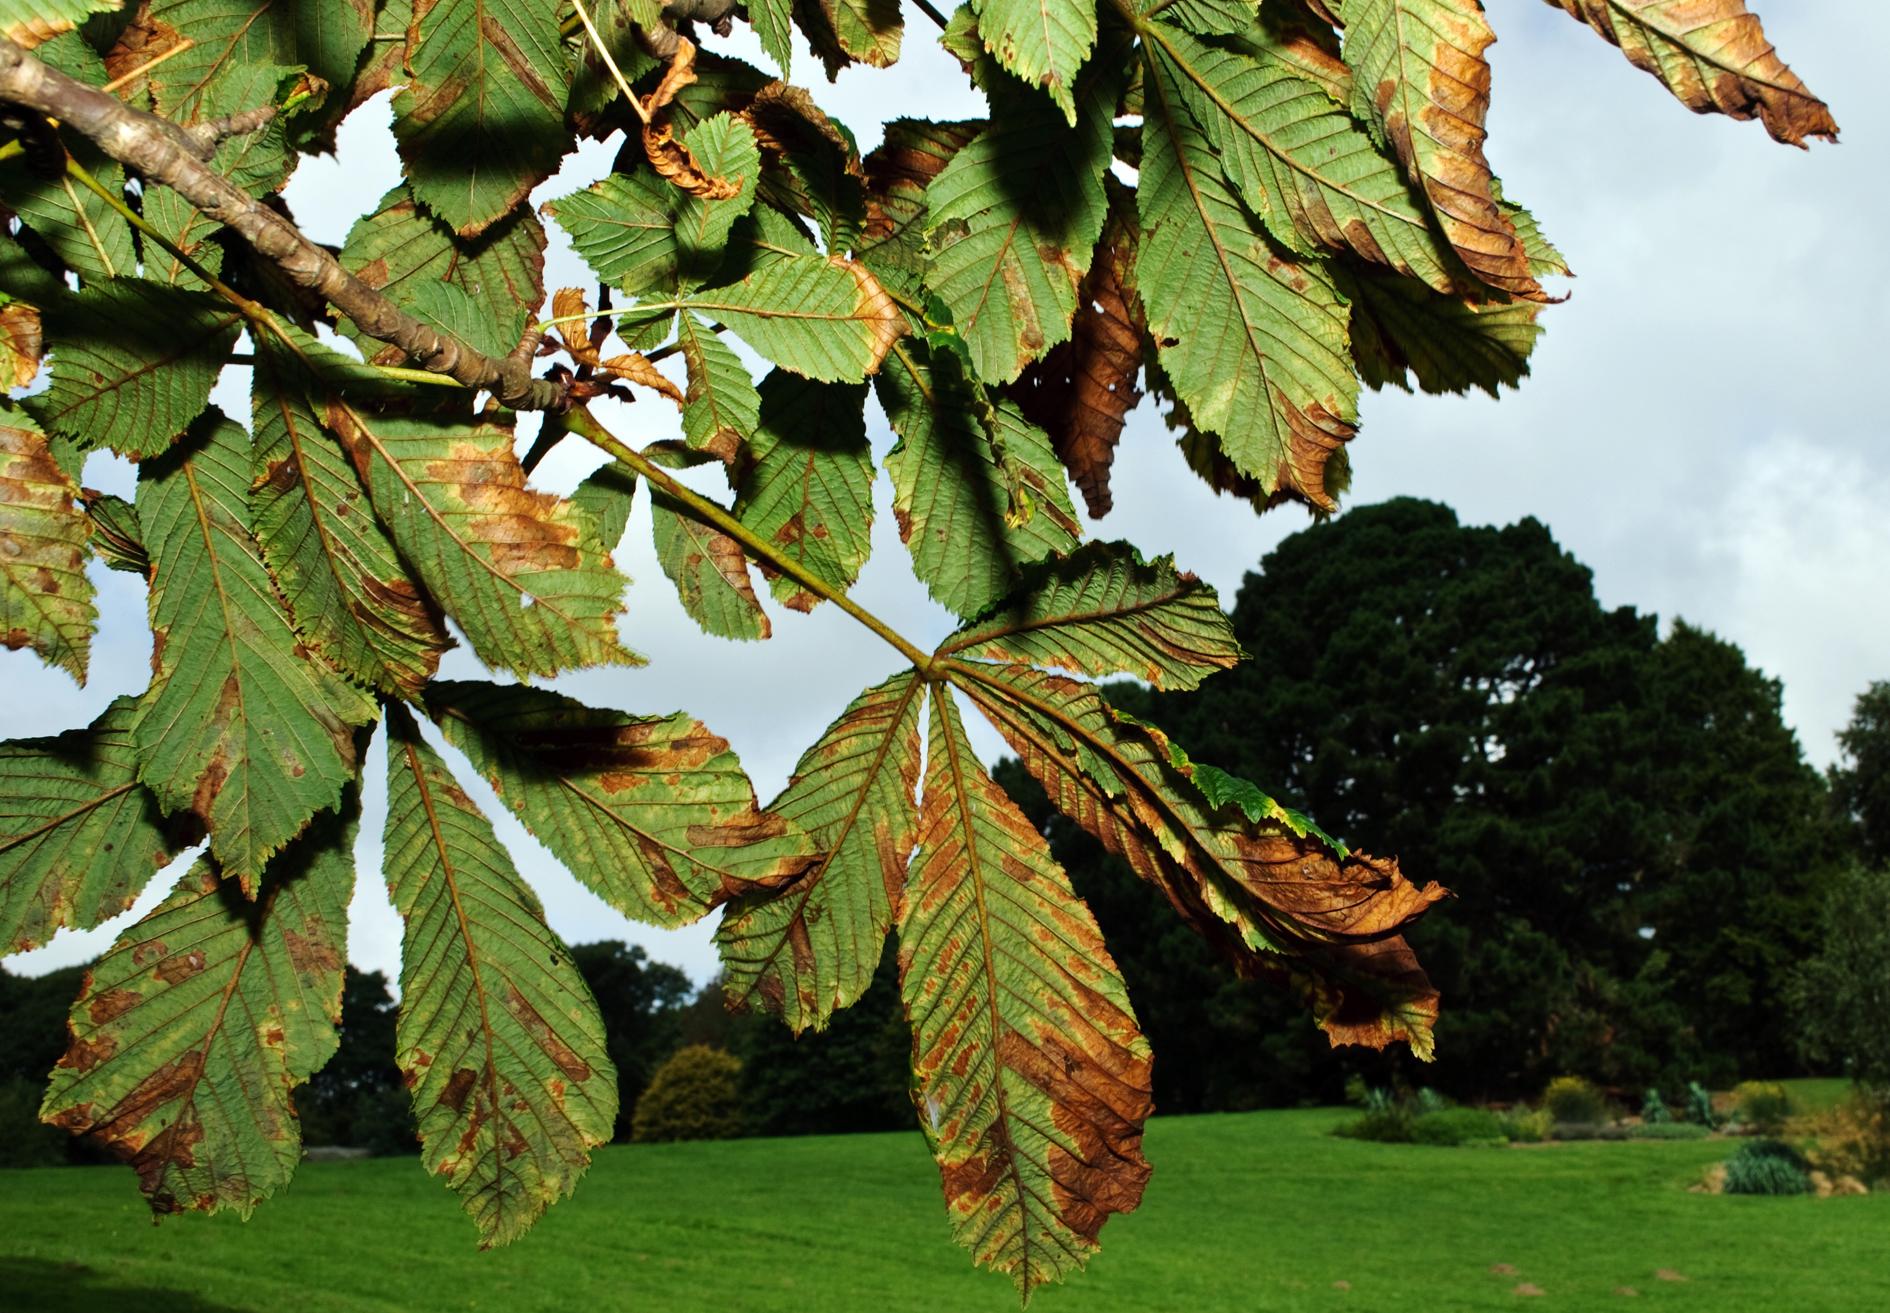 horse chestnut tree in autumn 2